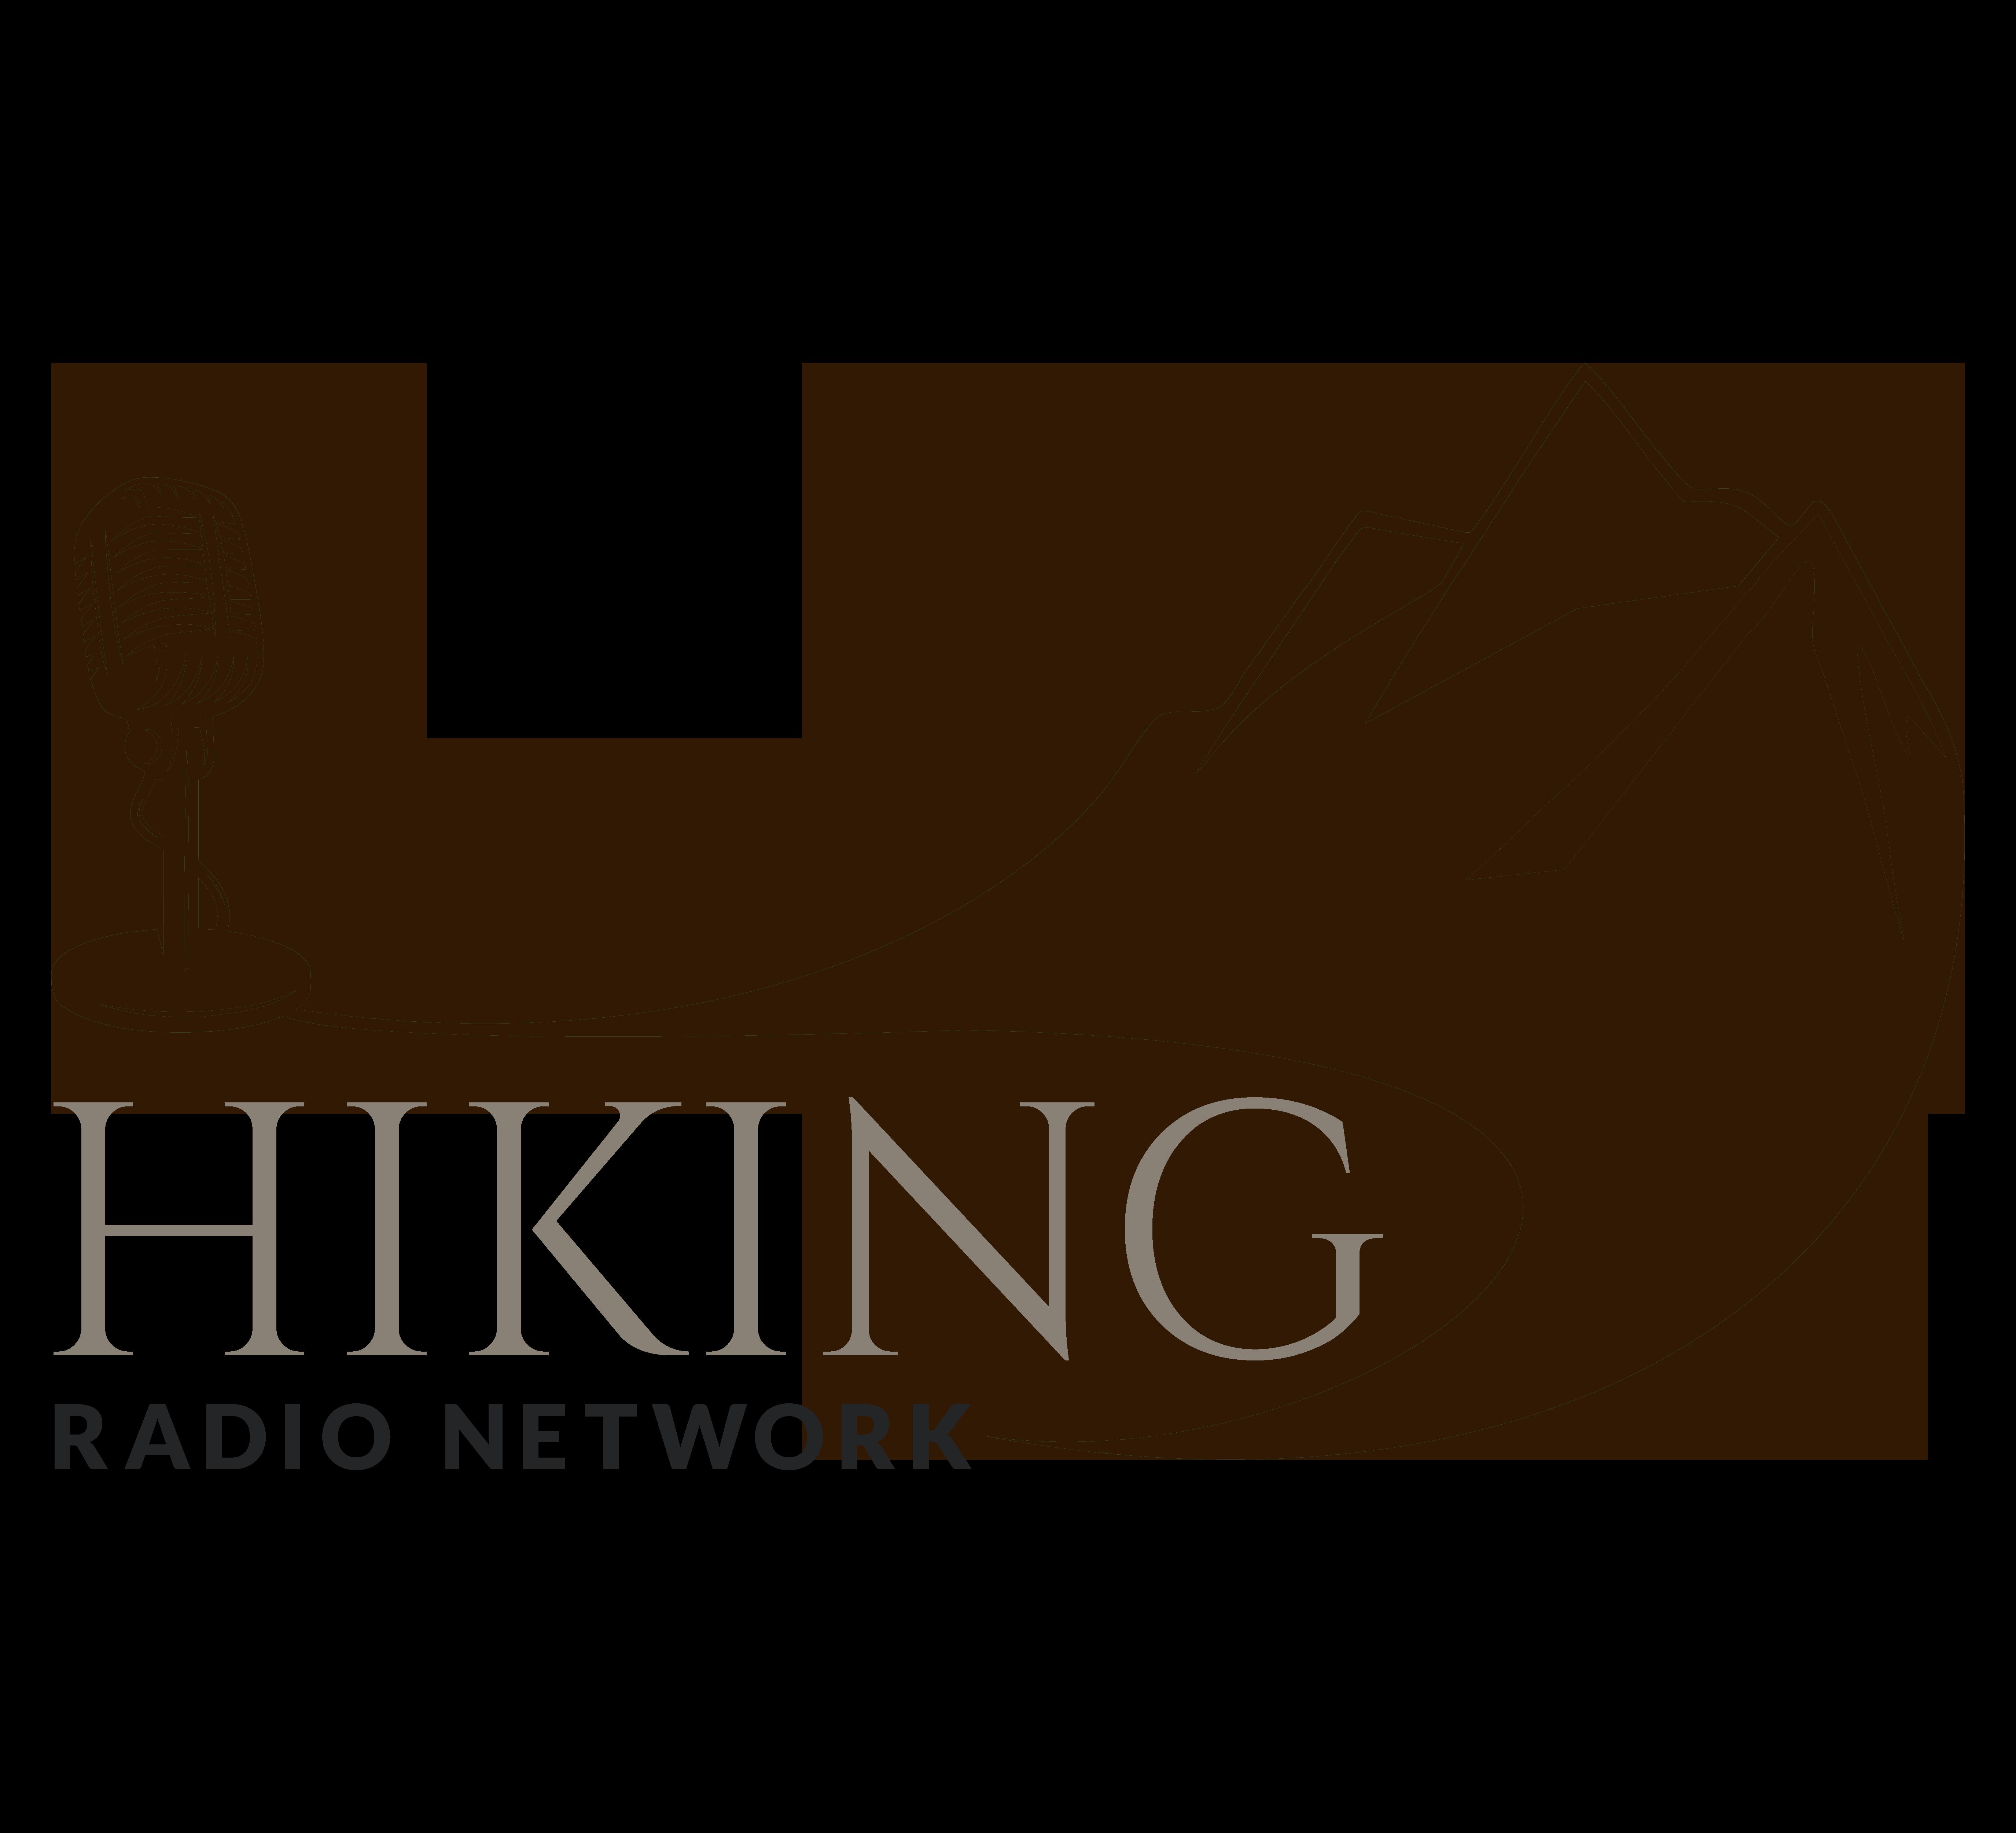 Hiking radio network talking. Hike clipart walking group